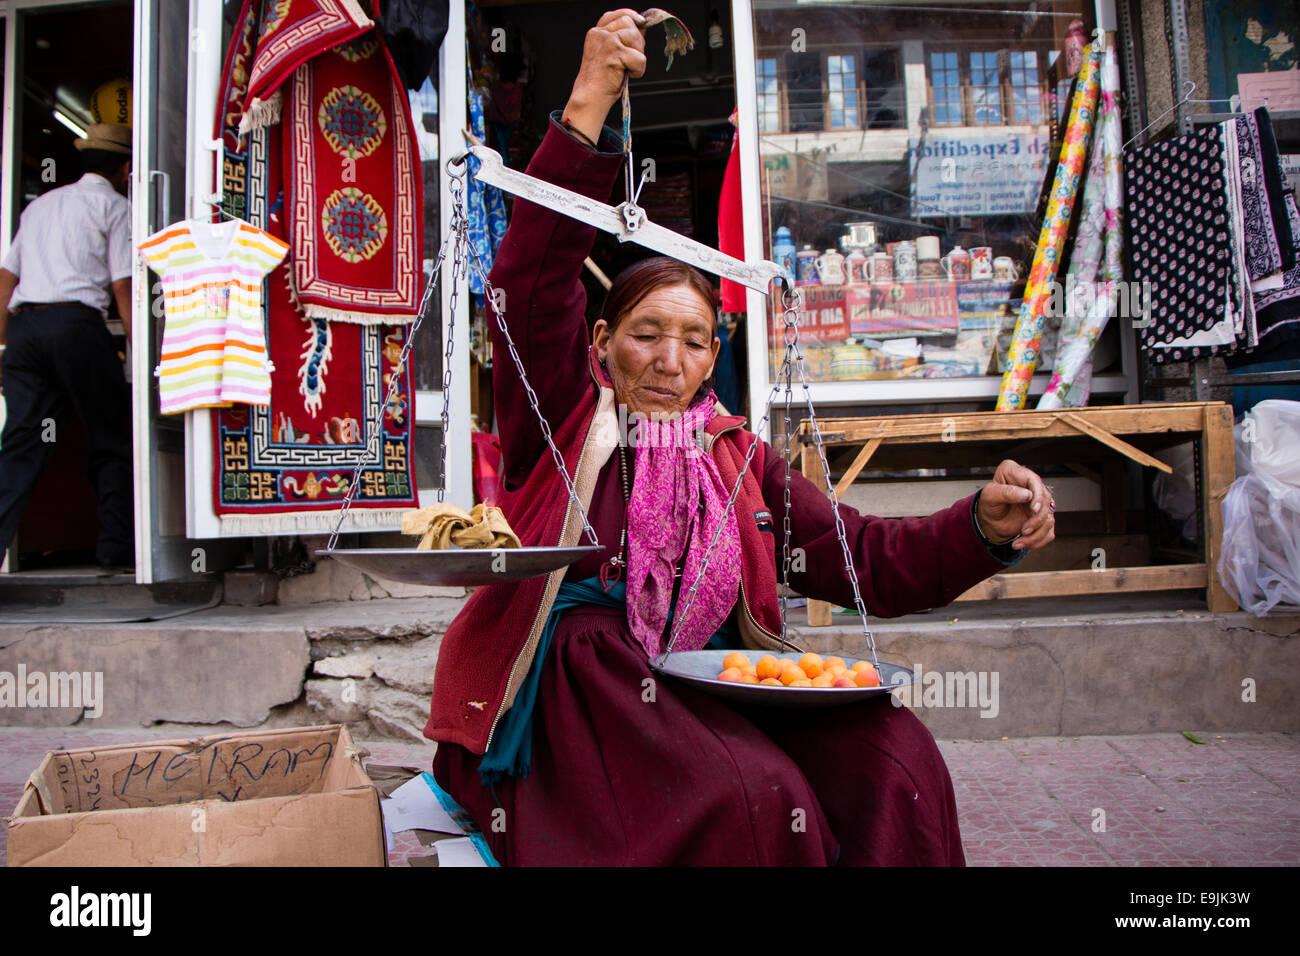 Woman selling apricots, Leh, Ladakh, Jammu and Kashmir, India - Stock Image